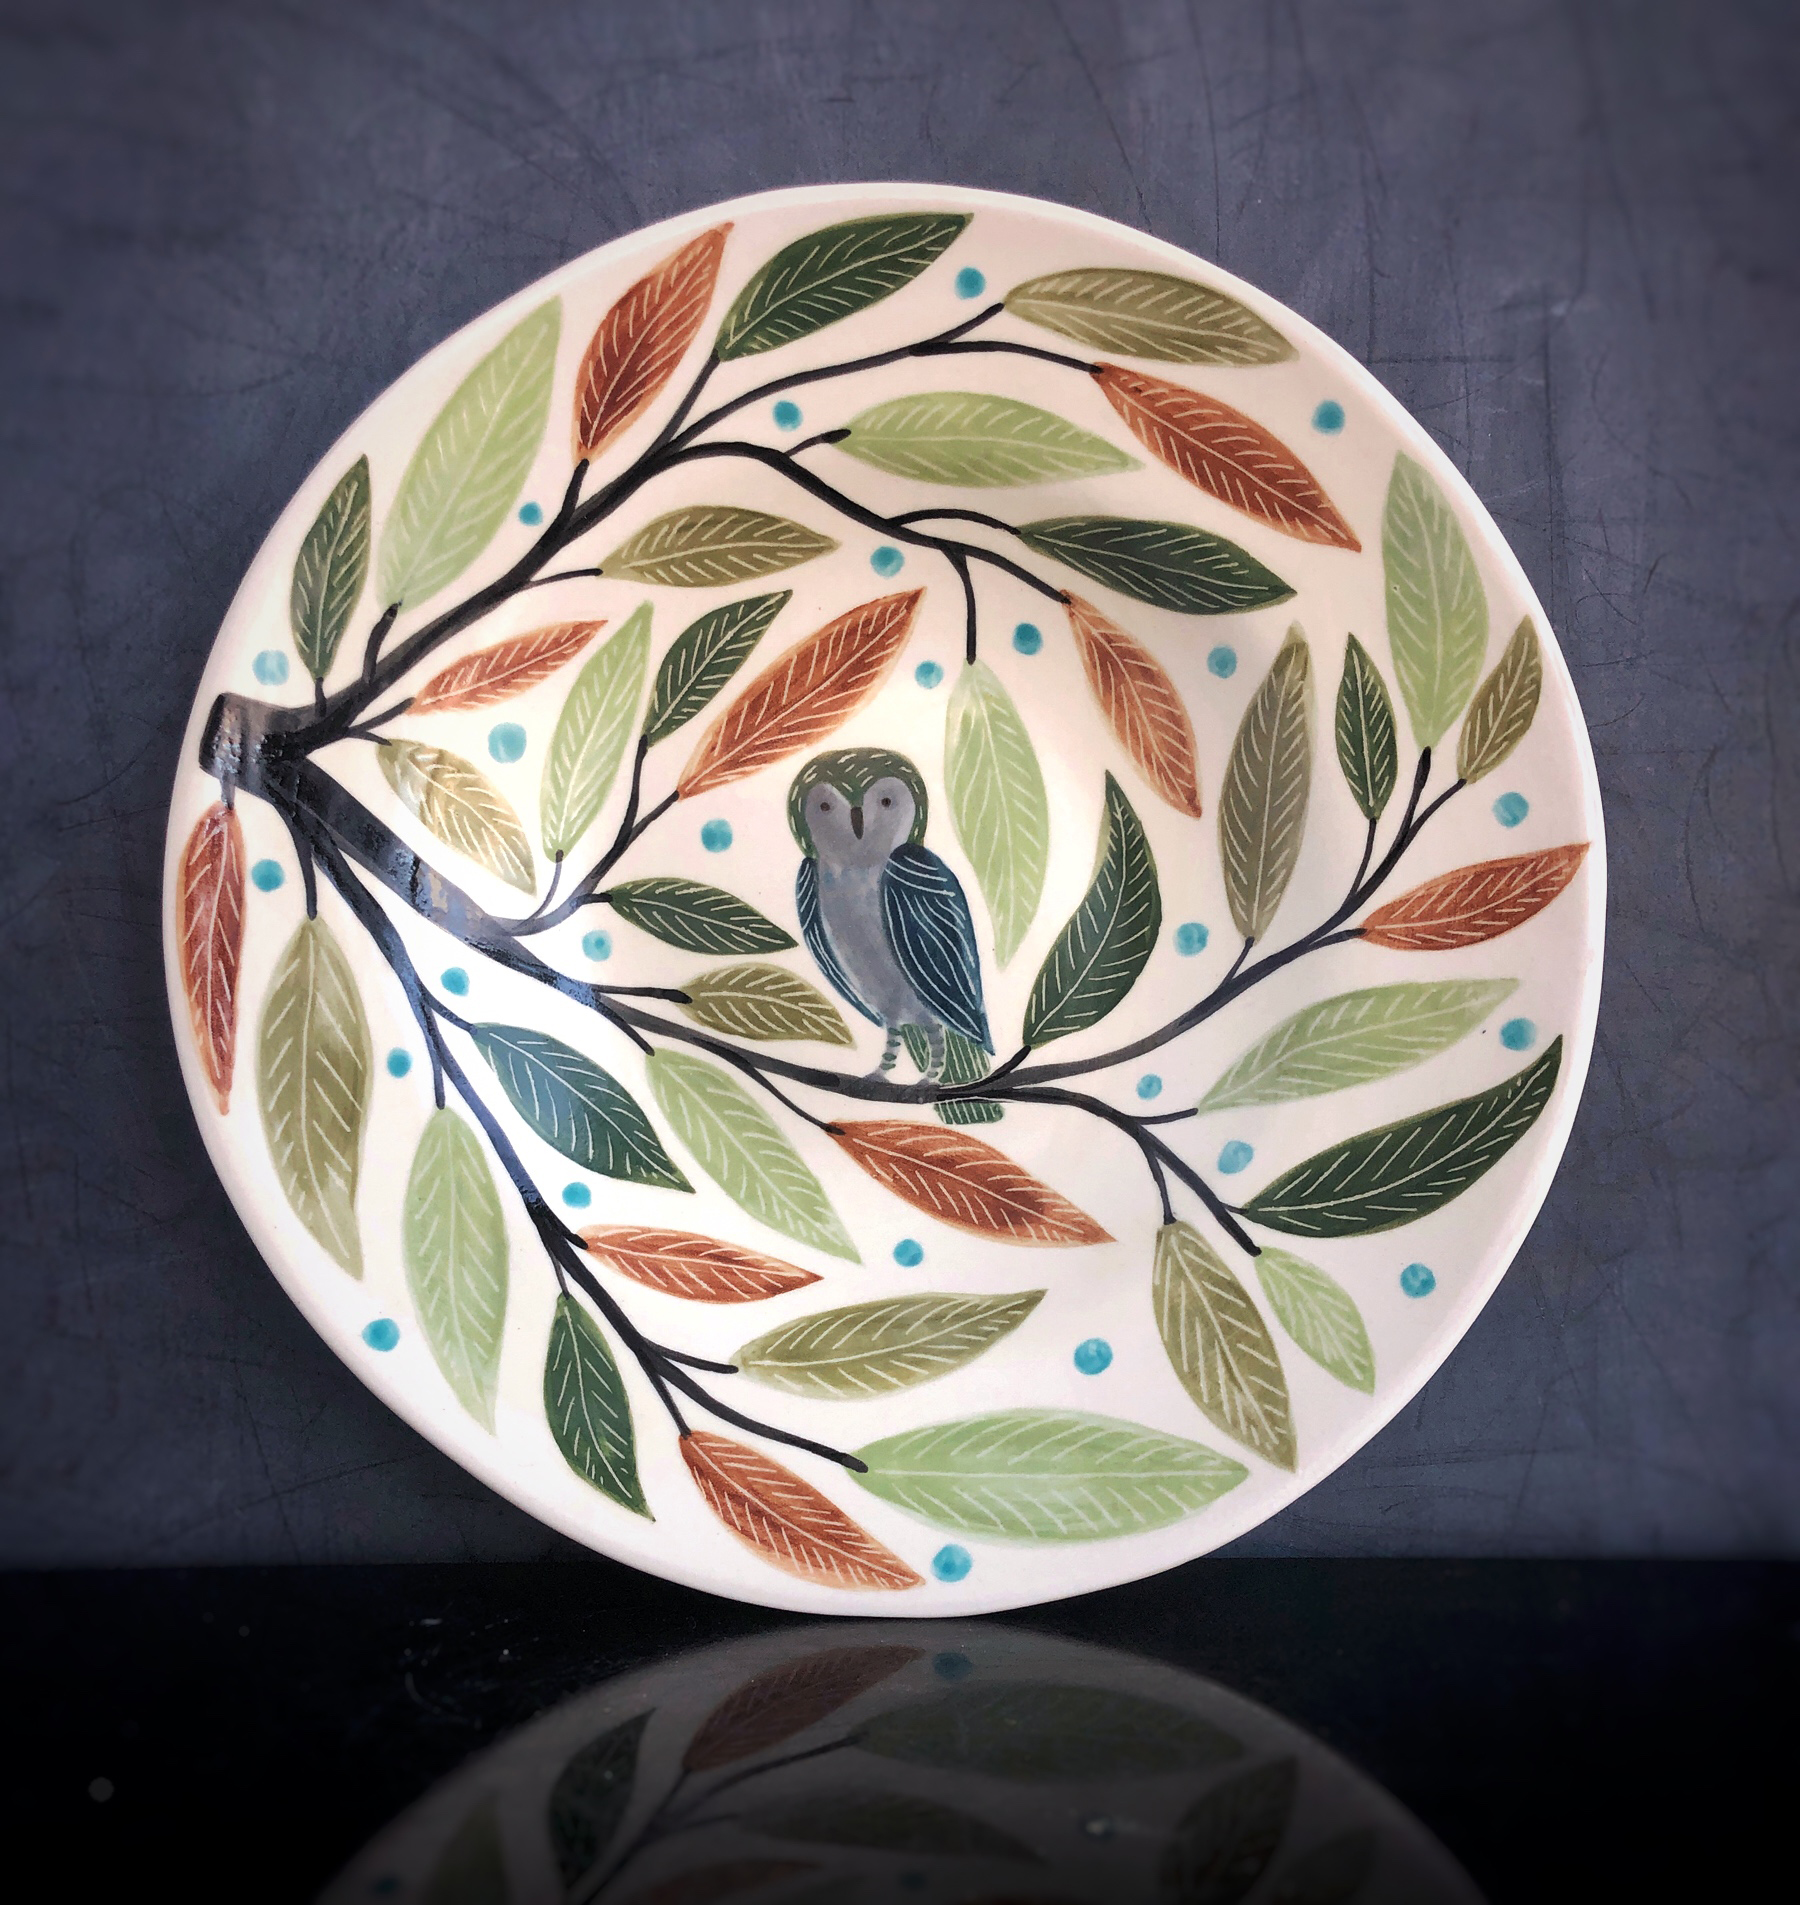 4-Gabrielle-Schaffner-porcelain-owl-serving-bowl.jpg